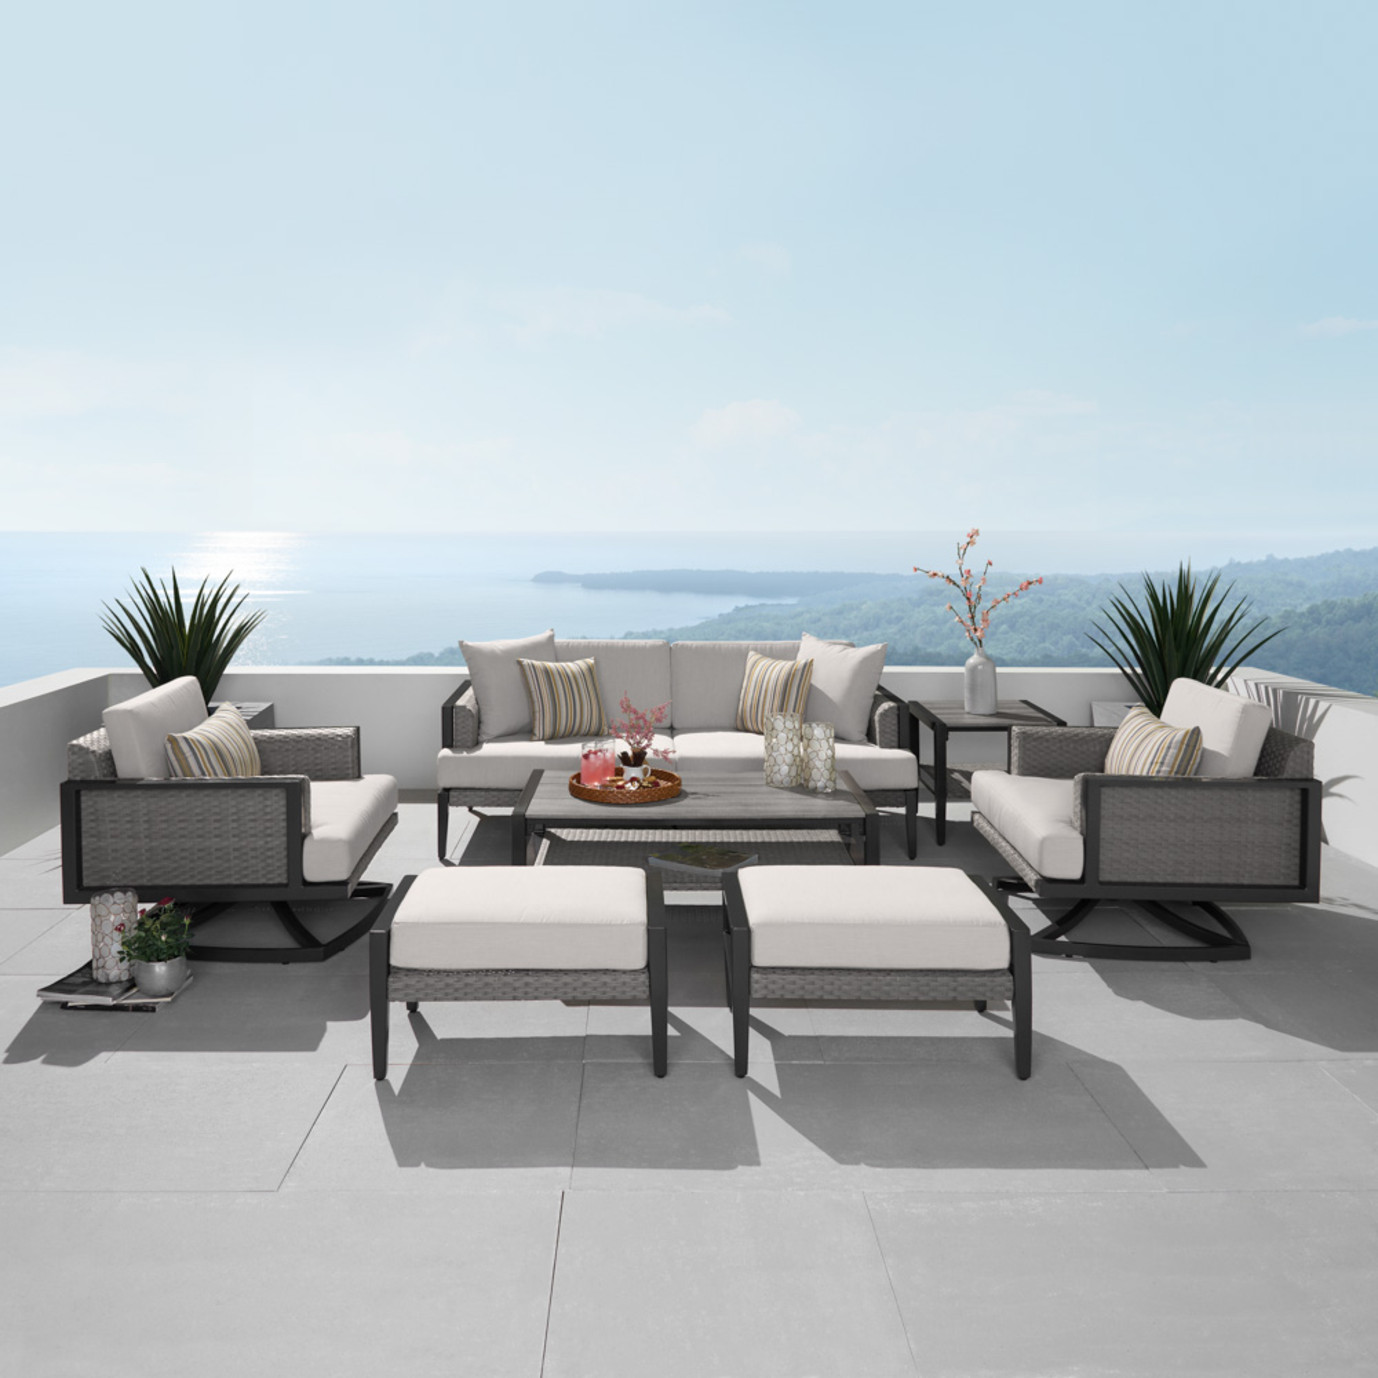 Vistano® 7 Piece Motion Seating Set